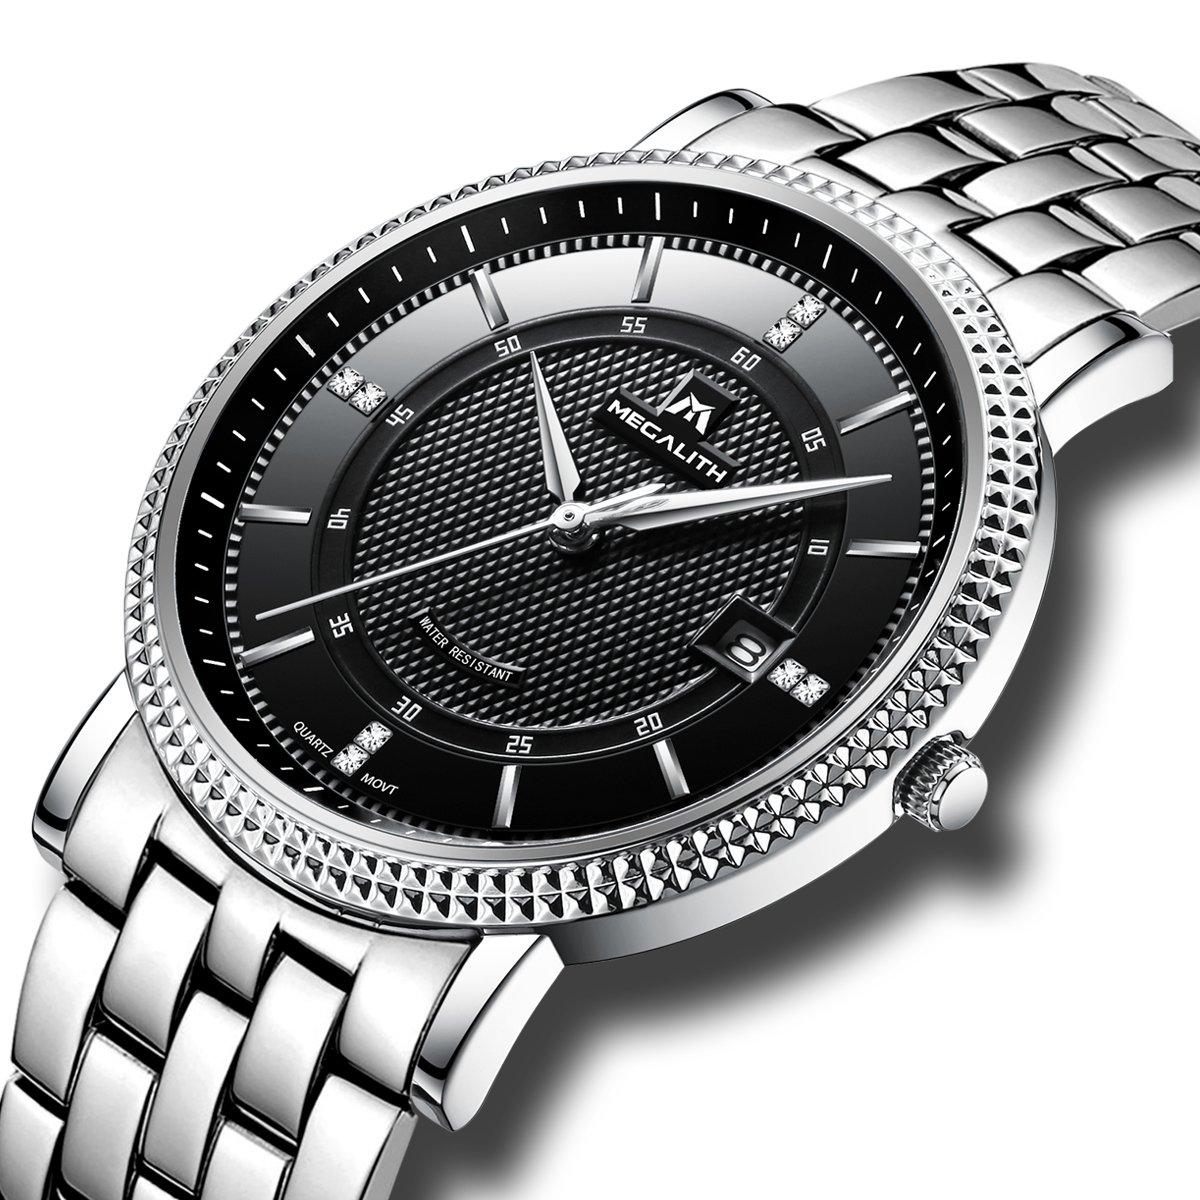 Mens Black Wrist Watches Men Waterproof Silver Stainless Steel Watches Date Luxury Thin Watch for Men